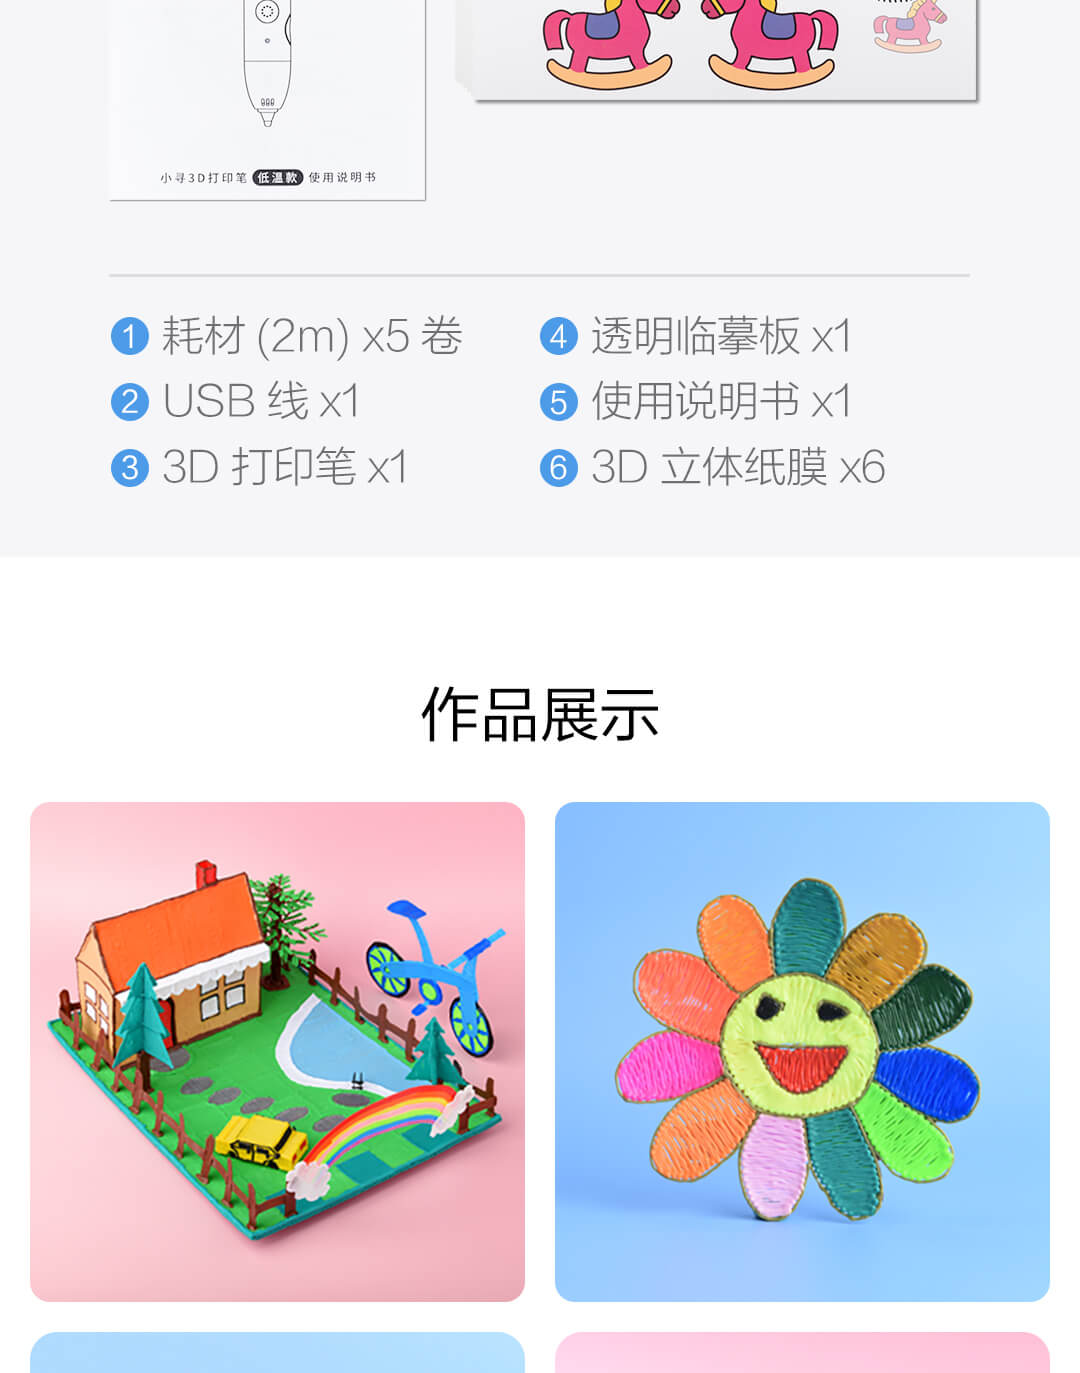 Product_奇妙_小寻3D打印笔